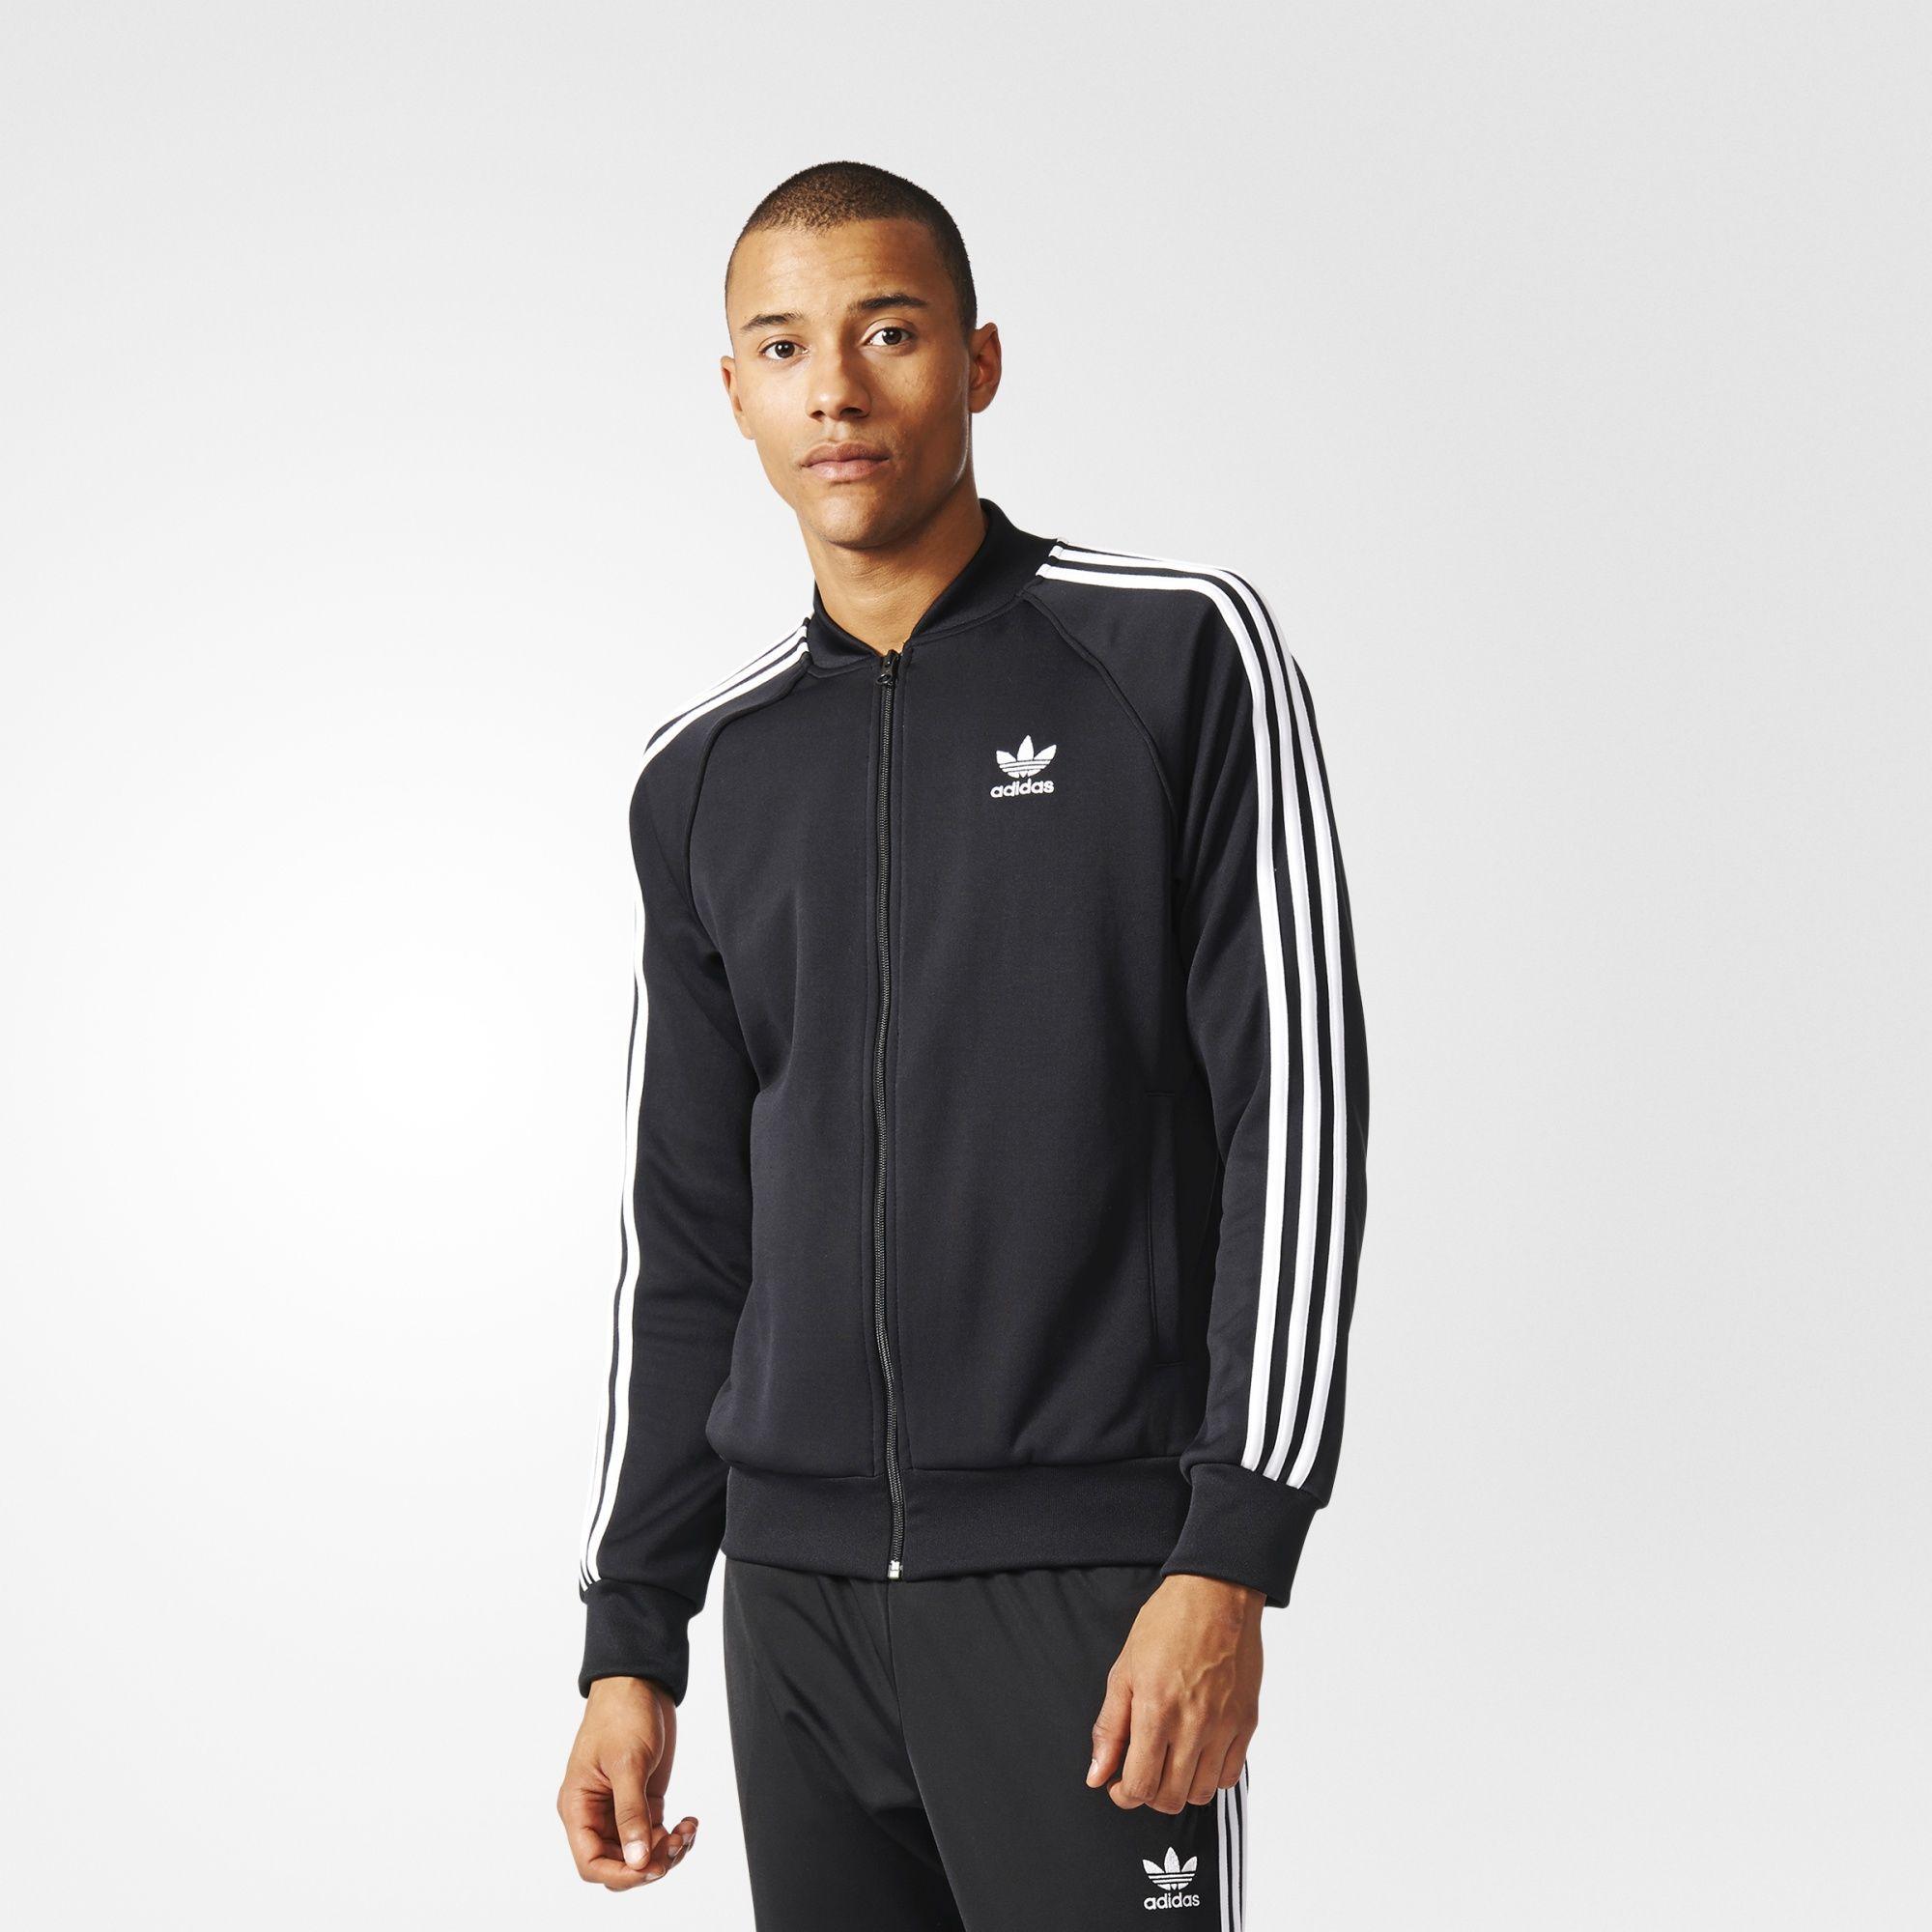 cbf081c3ff4b74 adidas - Superstar Track Jacket Adidas Jacket